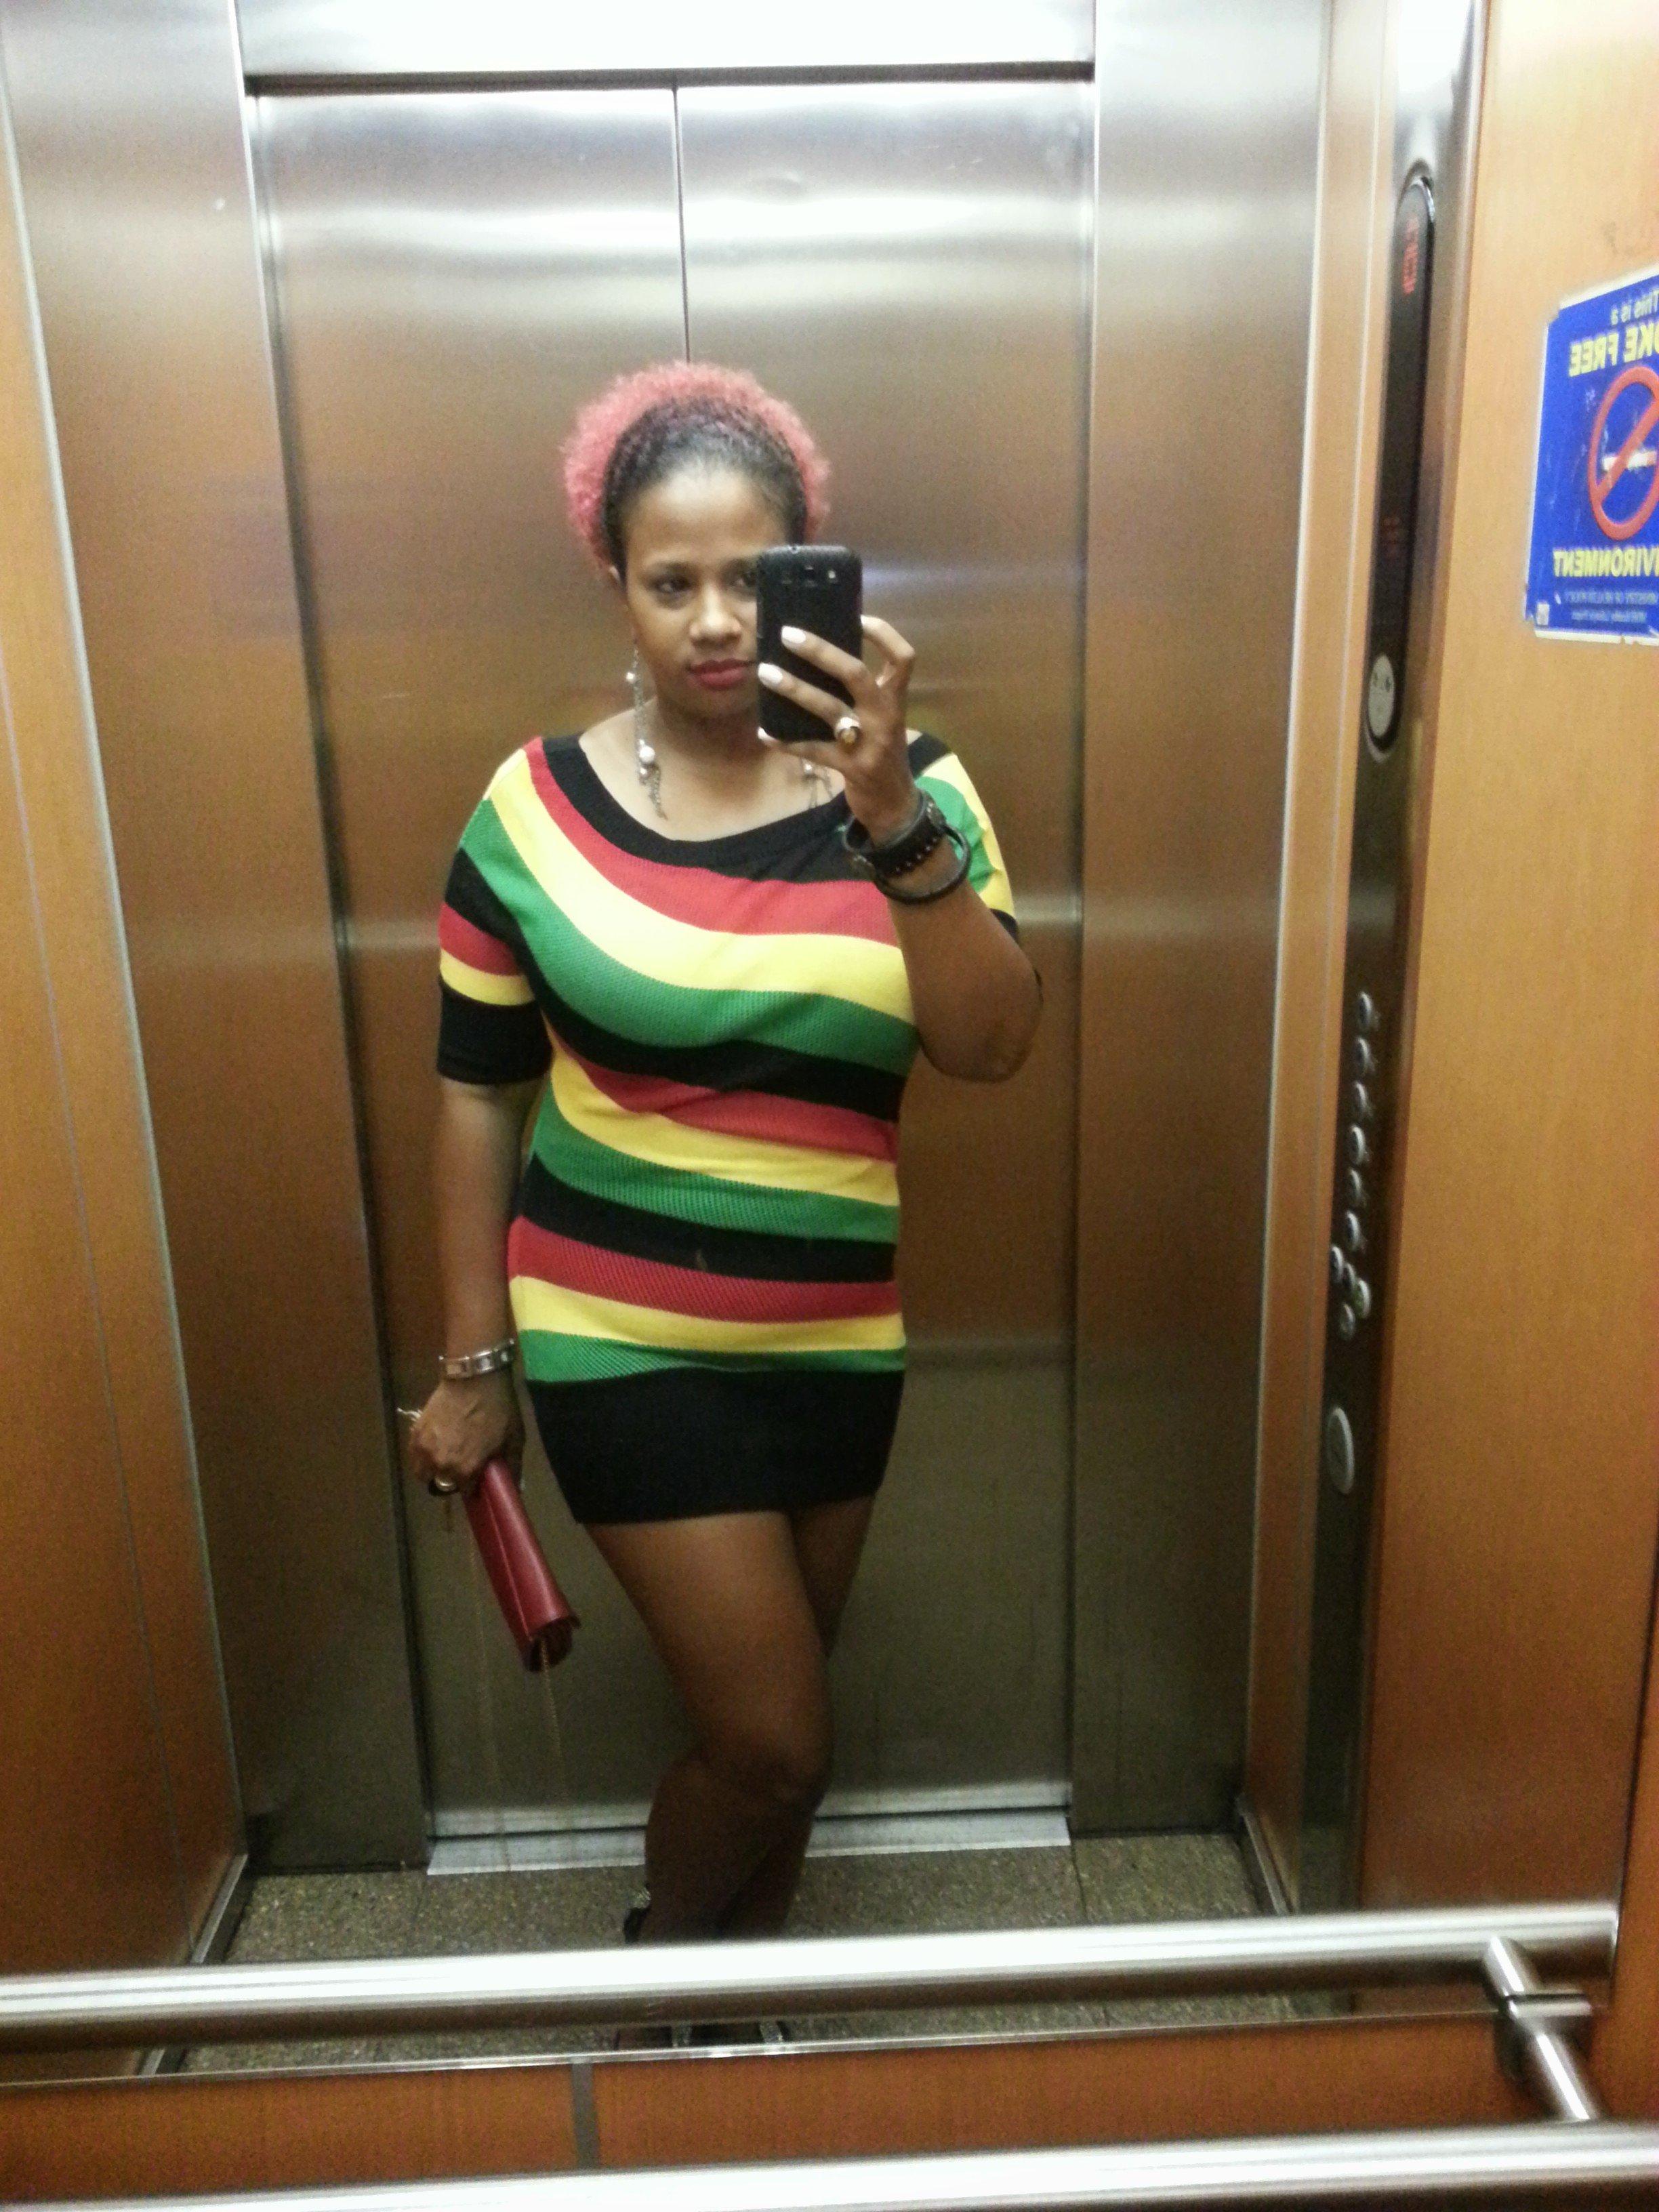 OOTD: Rasta Vibrations + Rihanna's Barbie Cake Dress